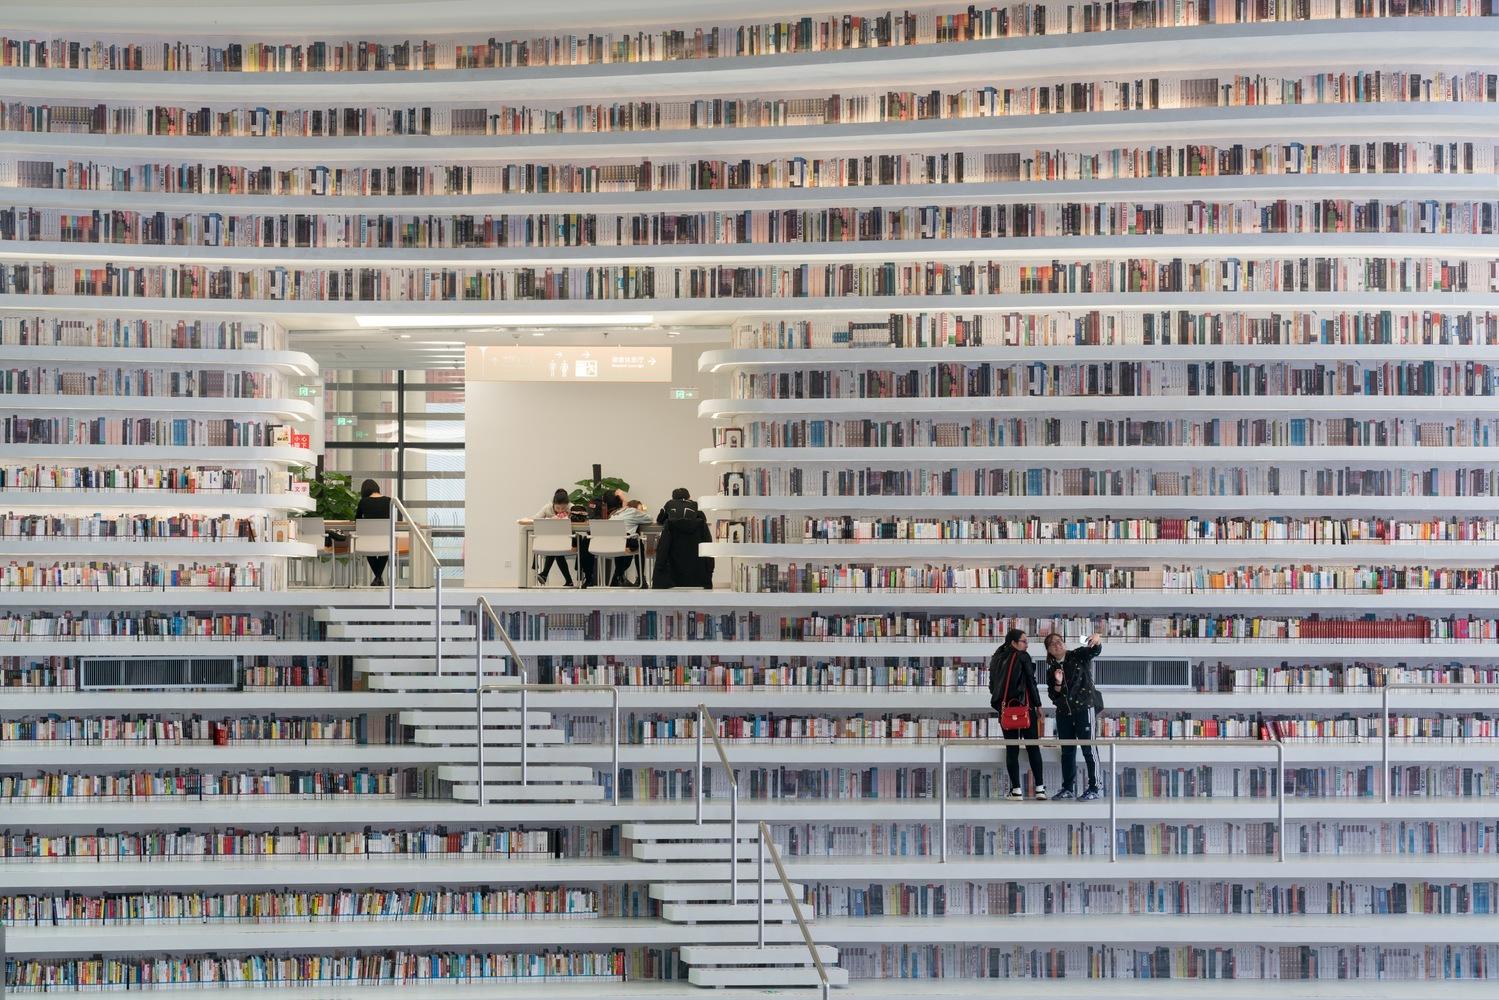 5_Tianjin Binhai Library_MVRDV_Inspirationist